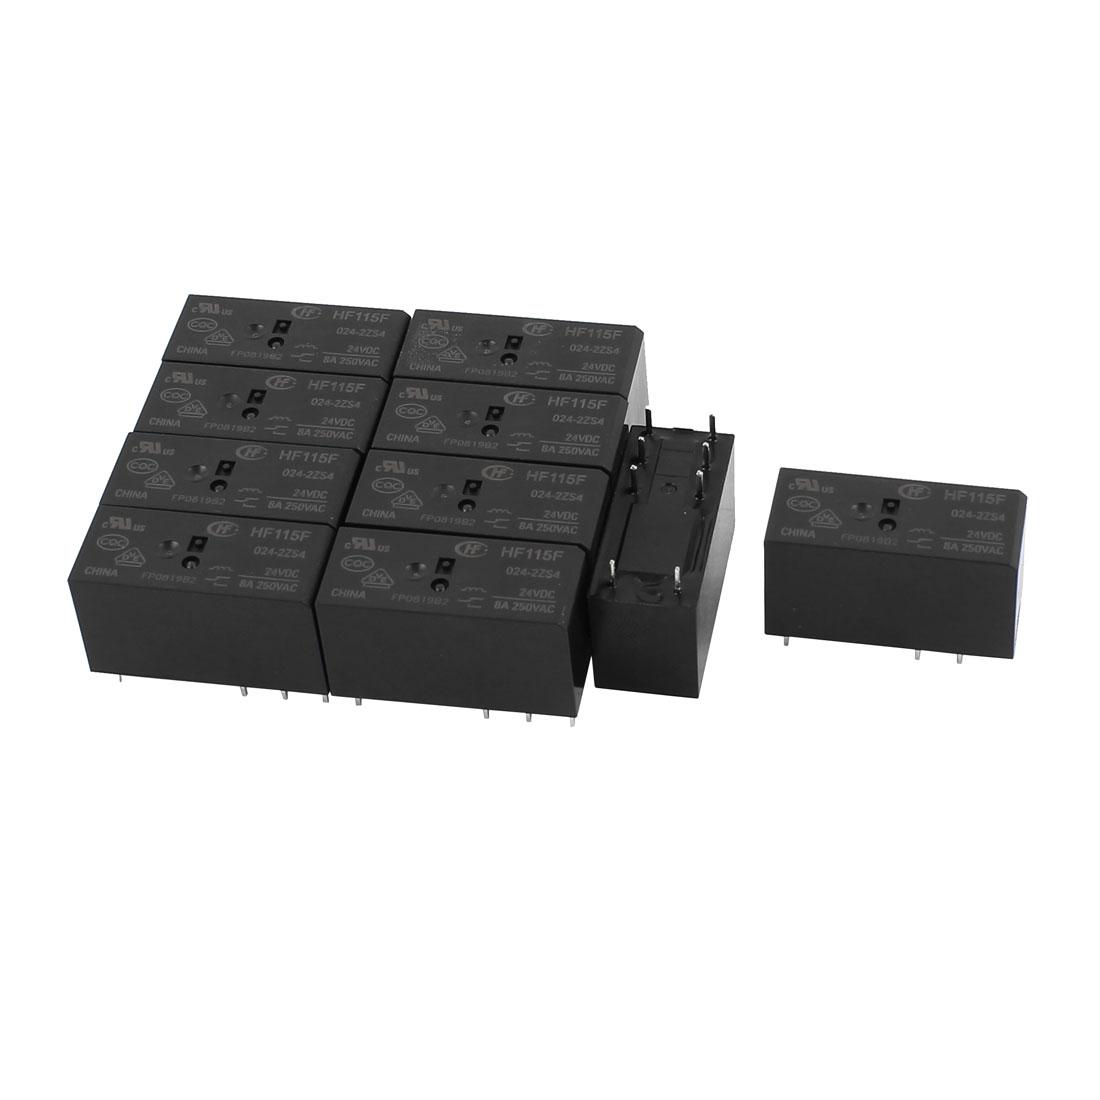 10 Pcs 24VDC 250VAC 8A 8 Terminal Dual Conversion DPDT HF-115F-024-2ZS4 Power Relay